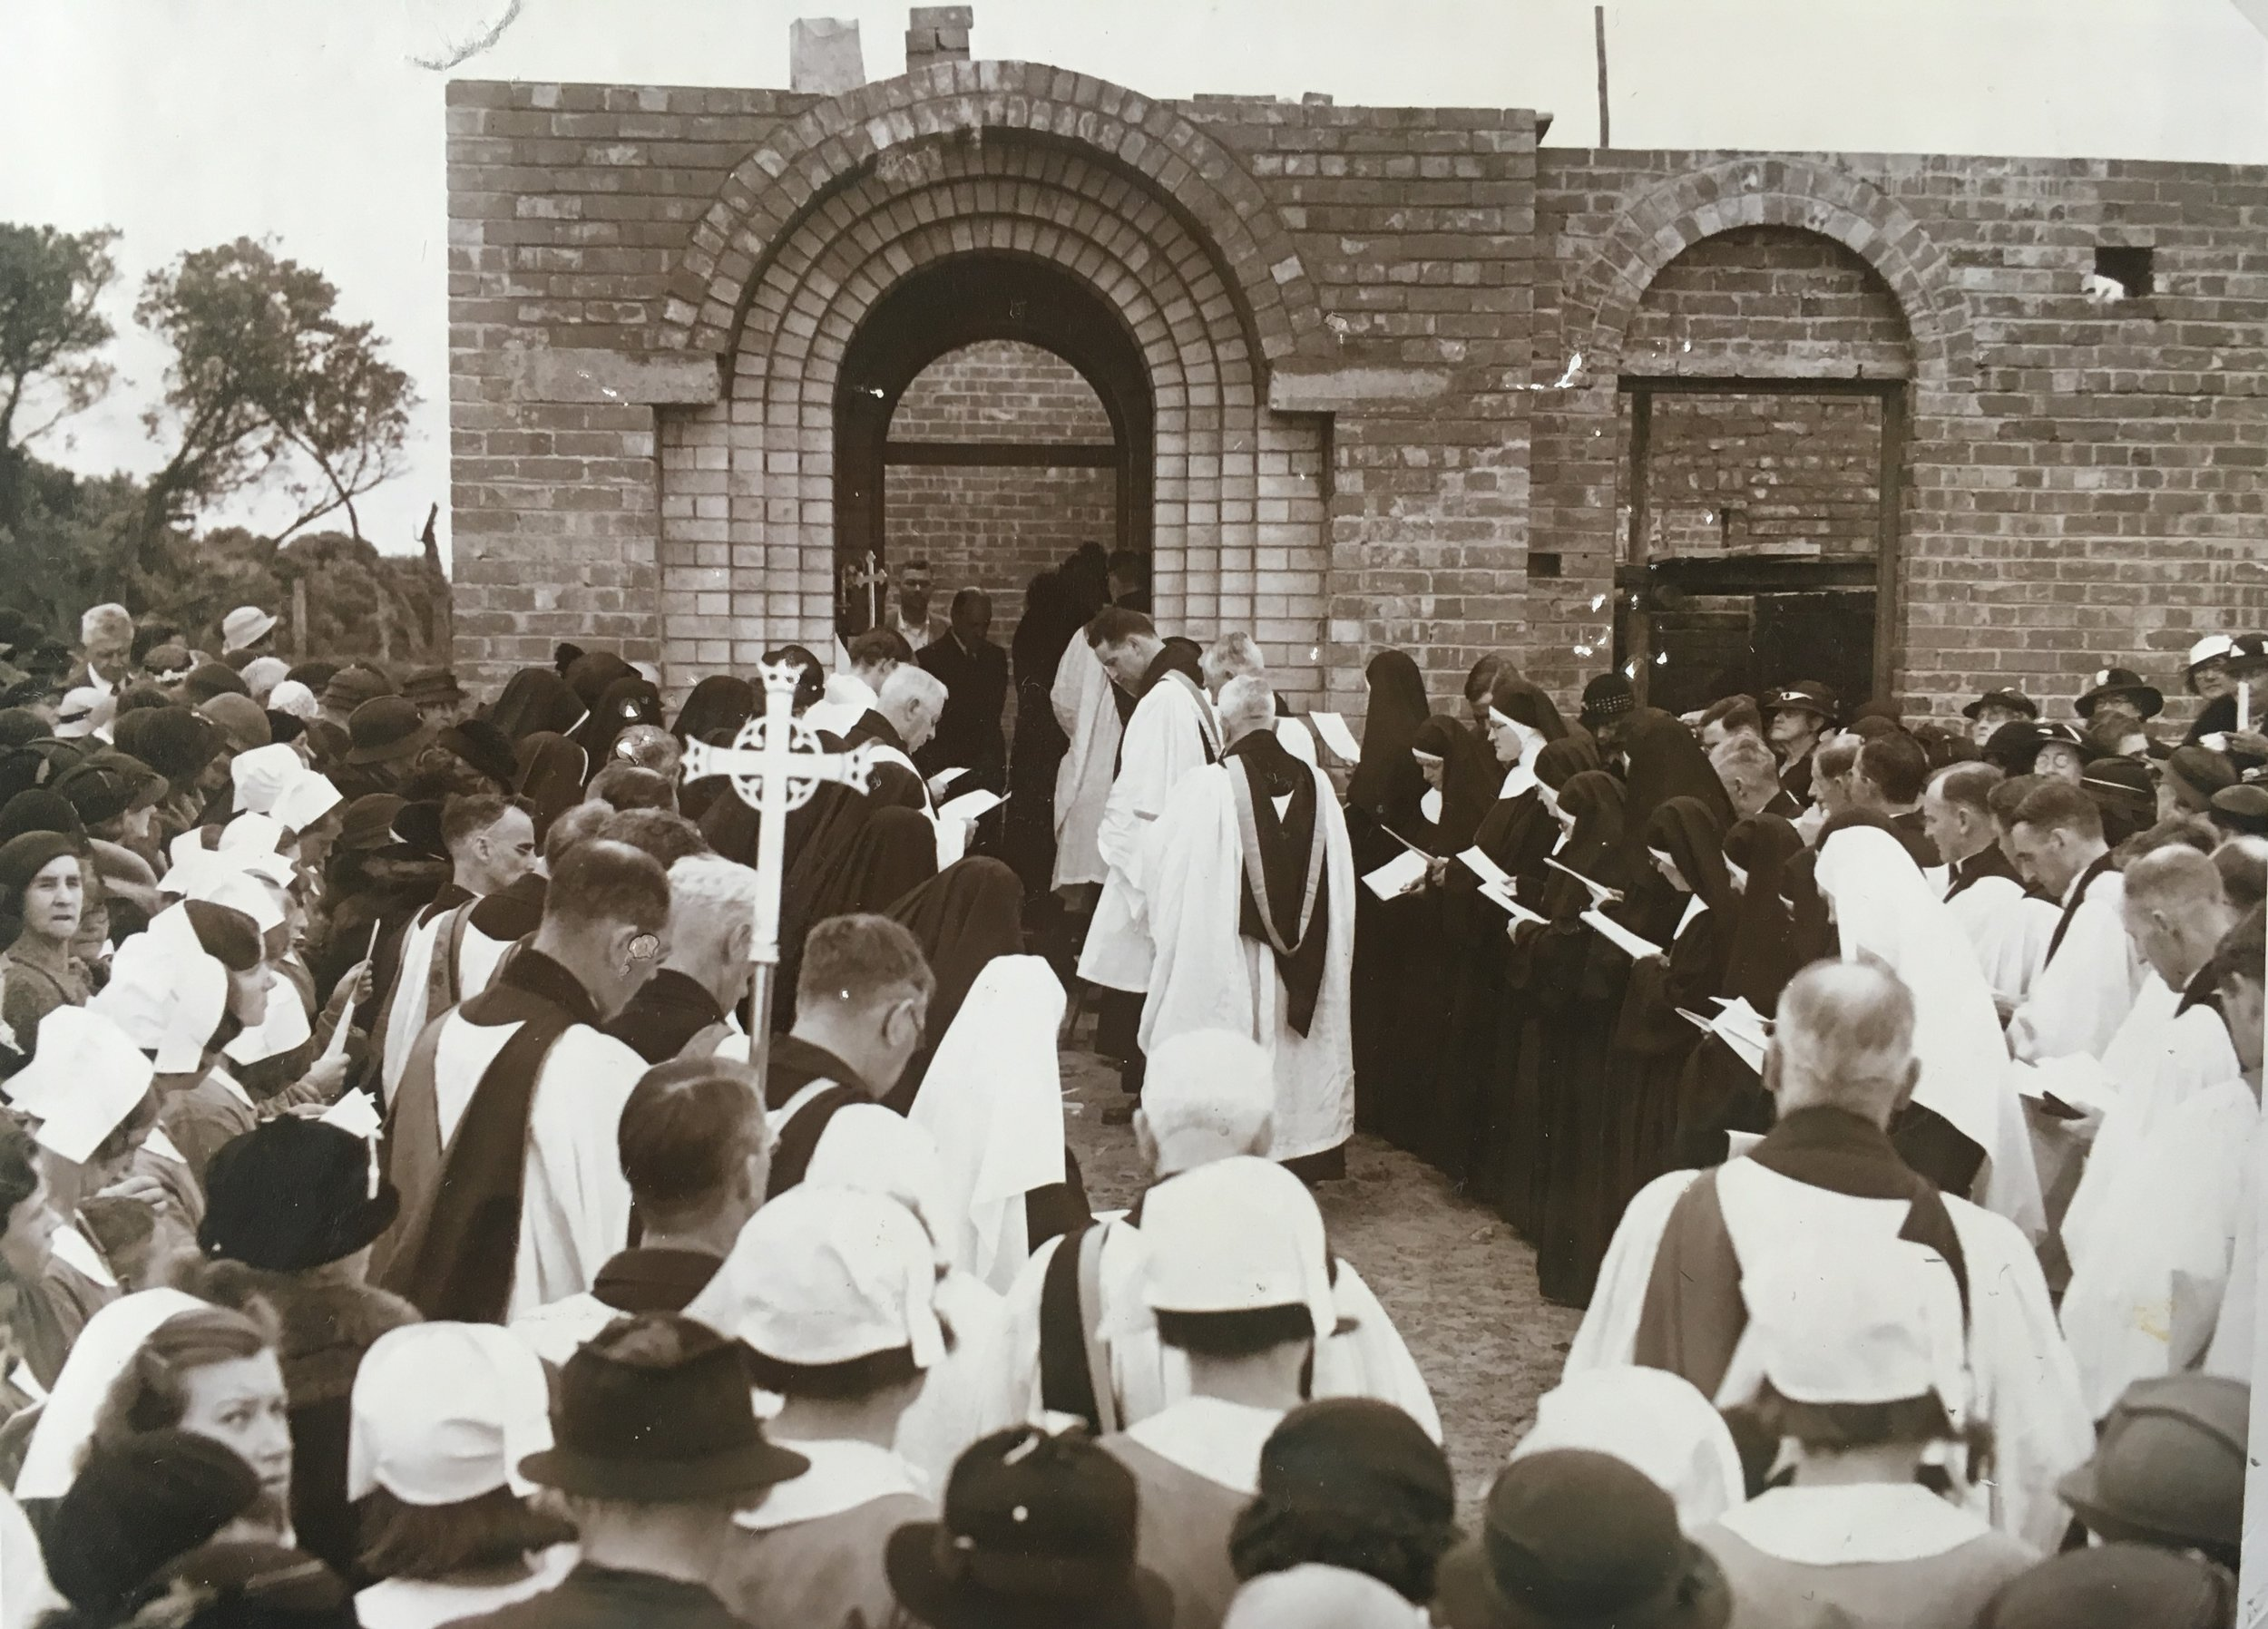 1935 entrance